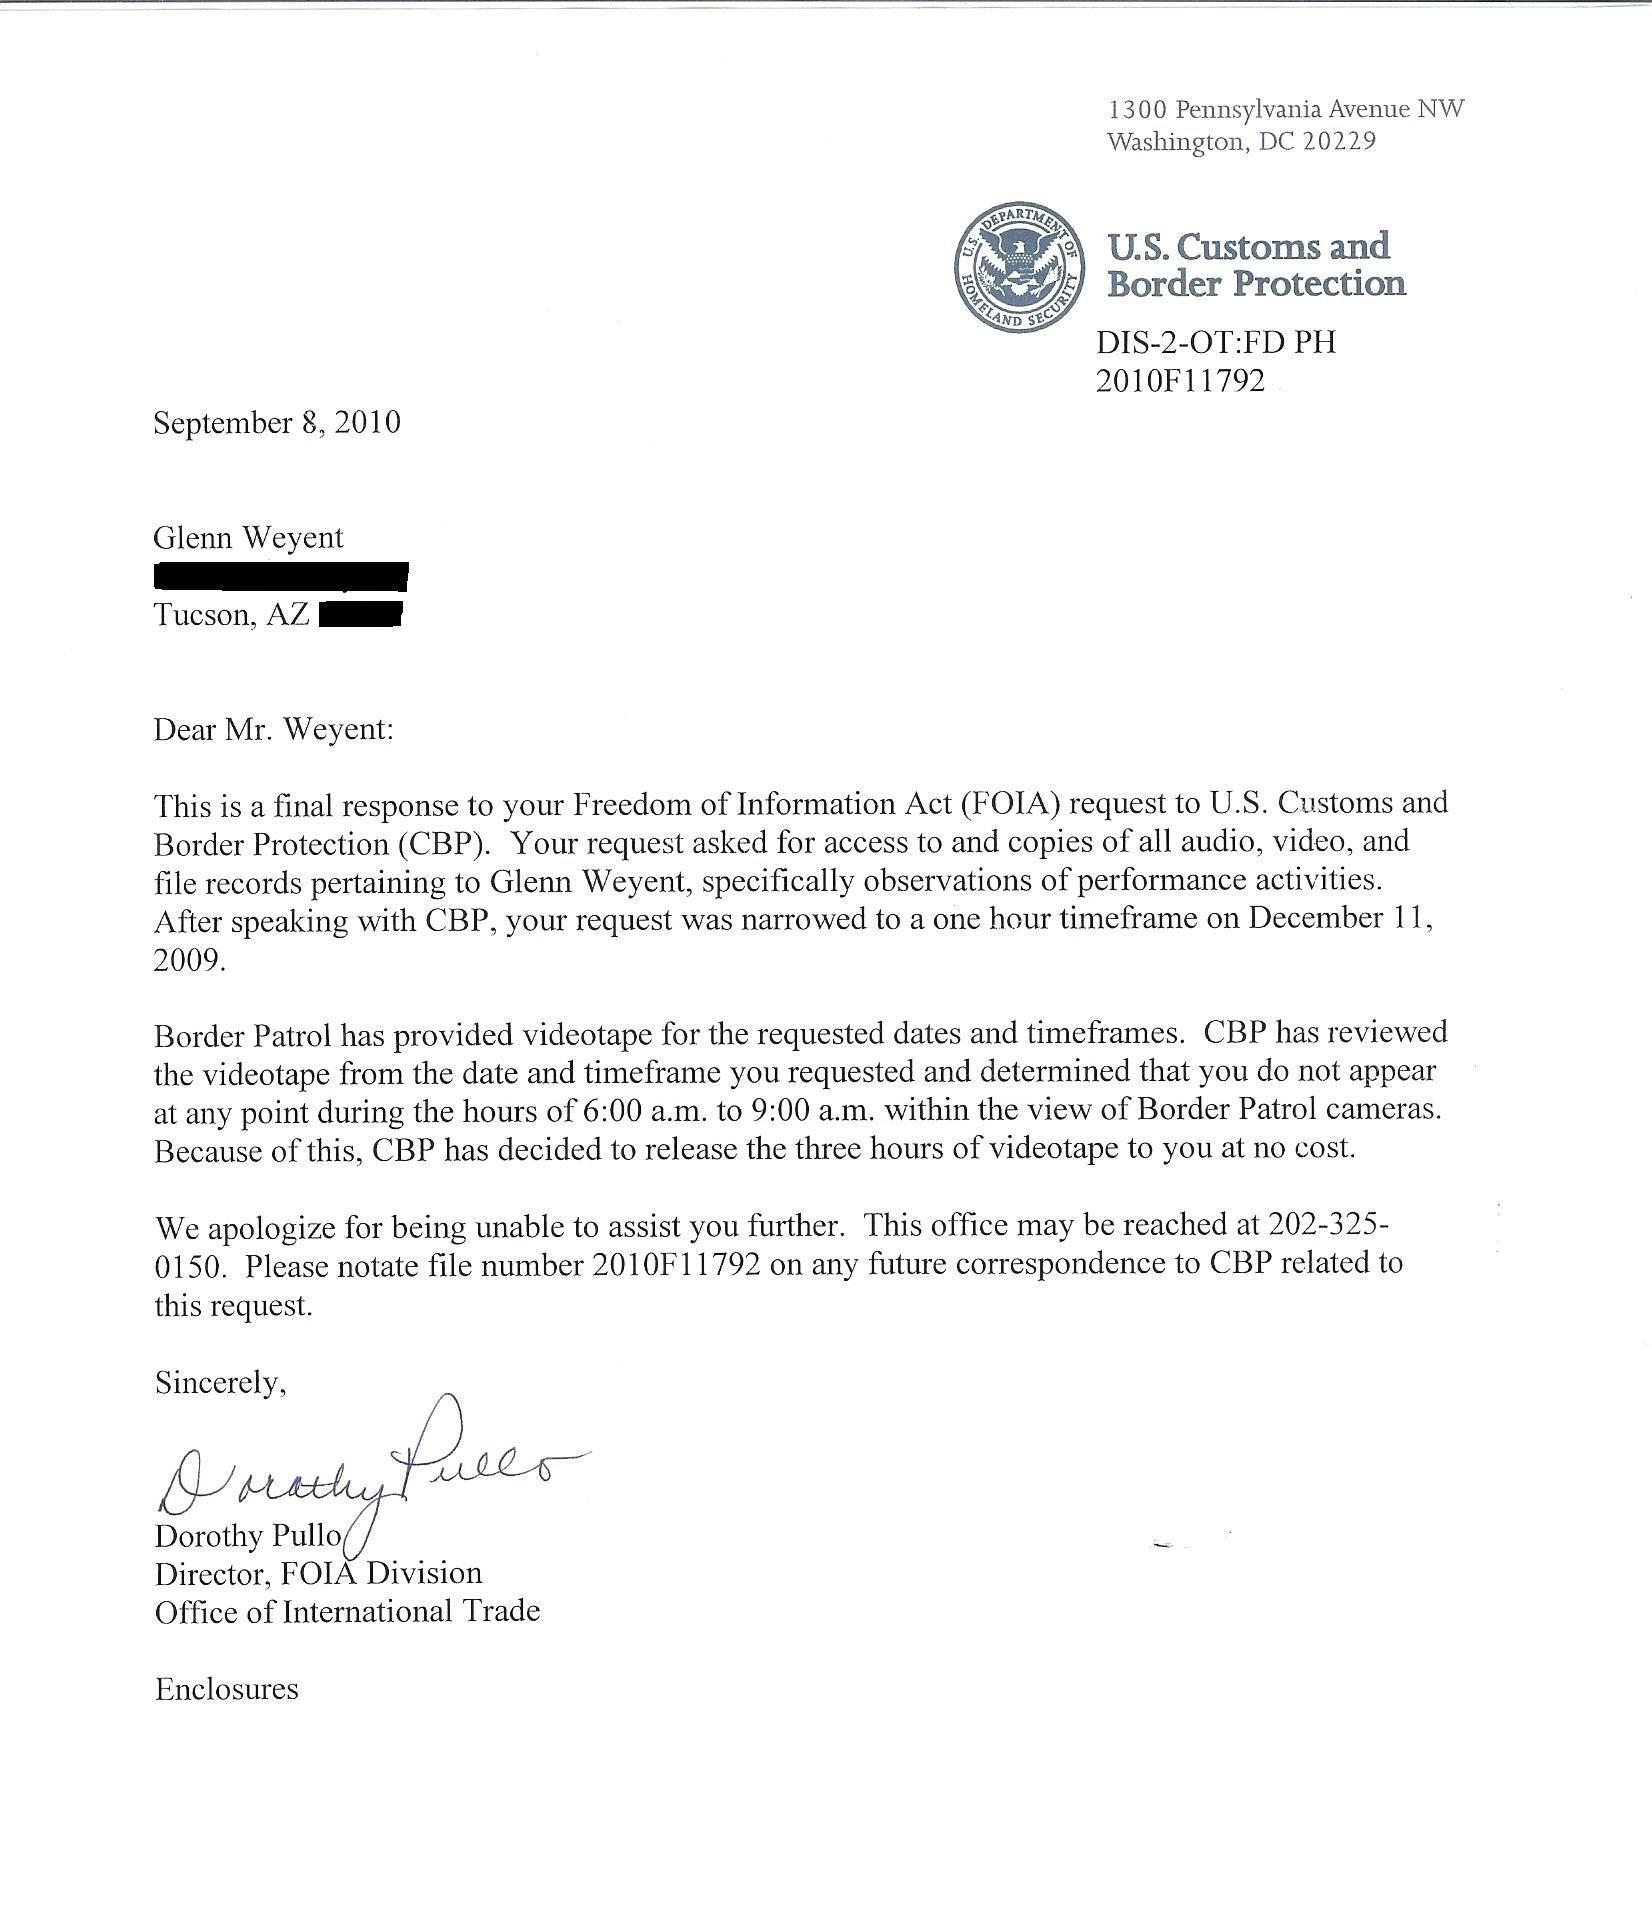 Immigration Reference Letter Sample Best Of Character Reference Letter For Immigration Personal Reference Letter Reference Letter Template Letter Template Word Sample humanitarian letter for immigration